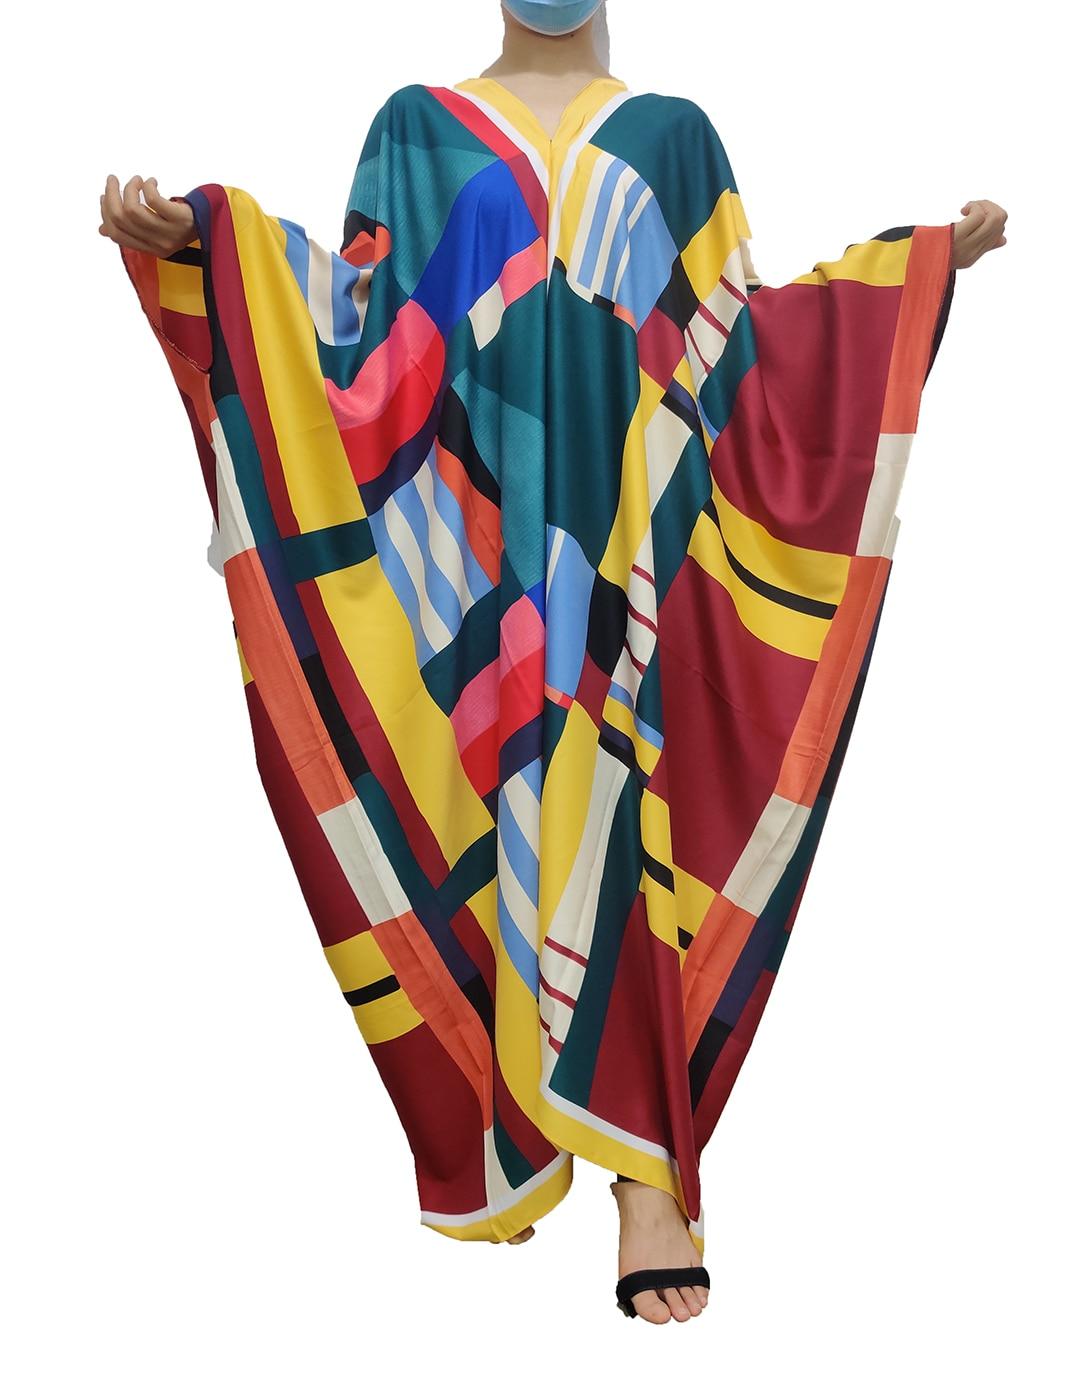 2021Winni جديد متعدد الألوان رمضان عيد عباية دبي تركيا موضة مسلمة الكويت التقليدية الخامس الرقبة كامل طول الحرير فستان قفطان